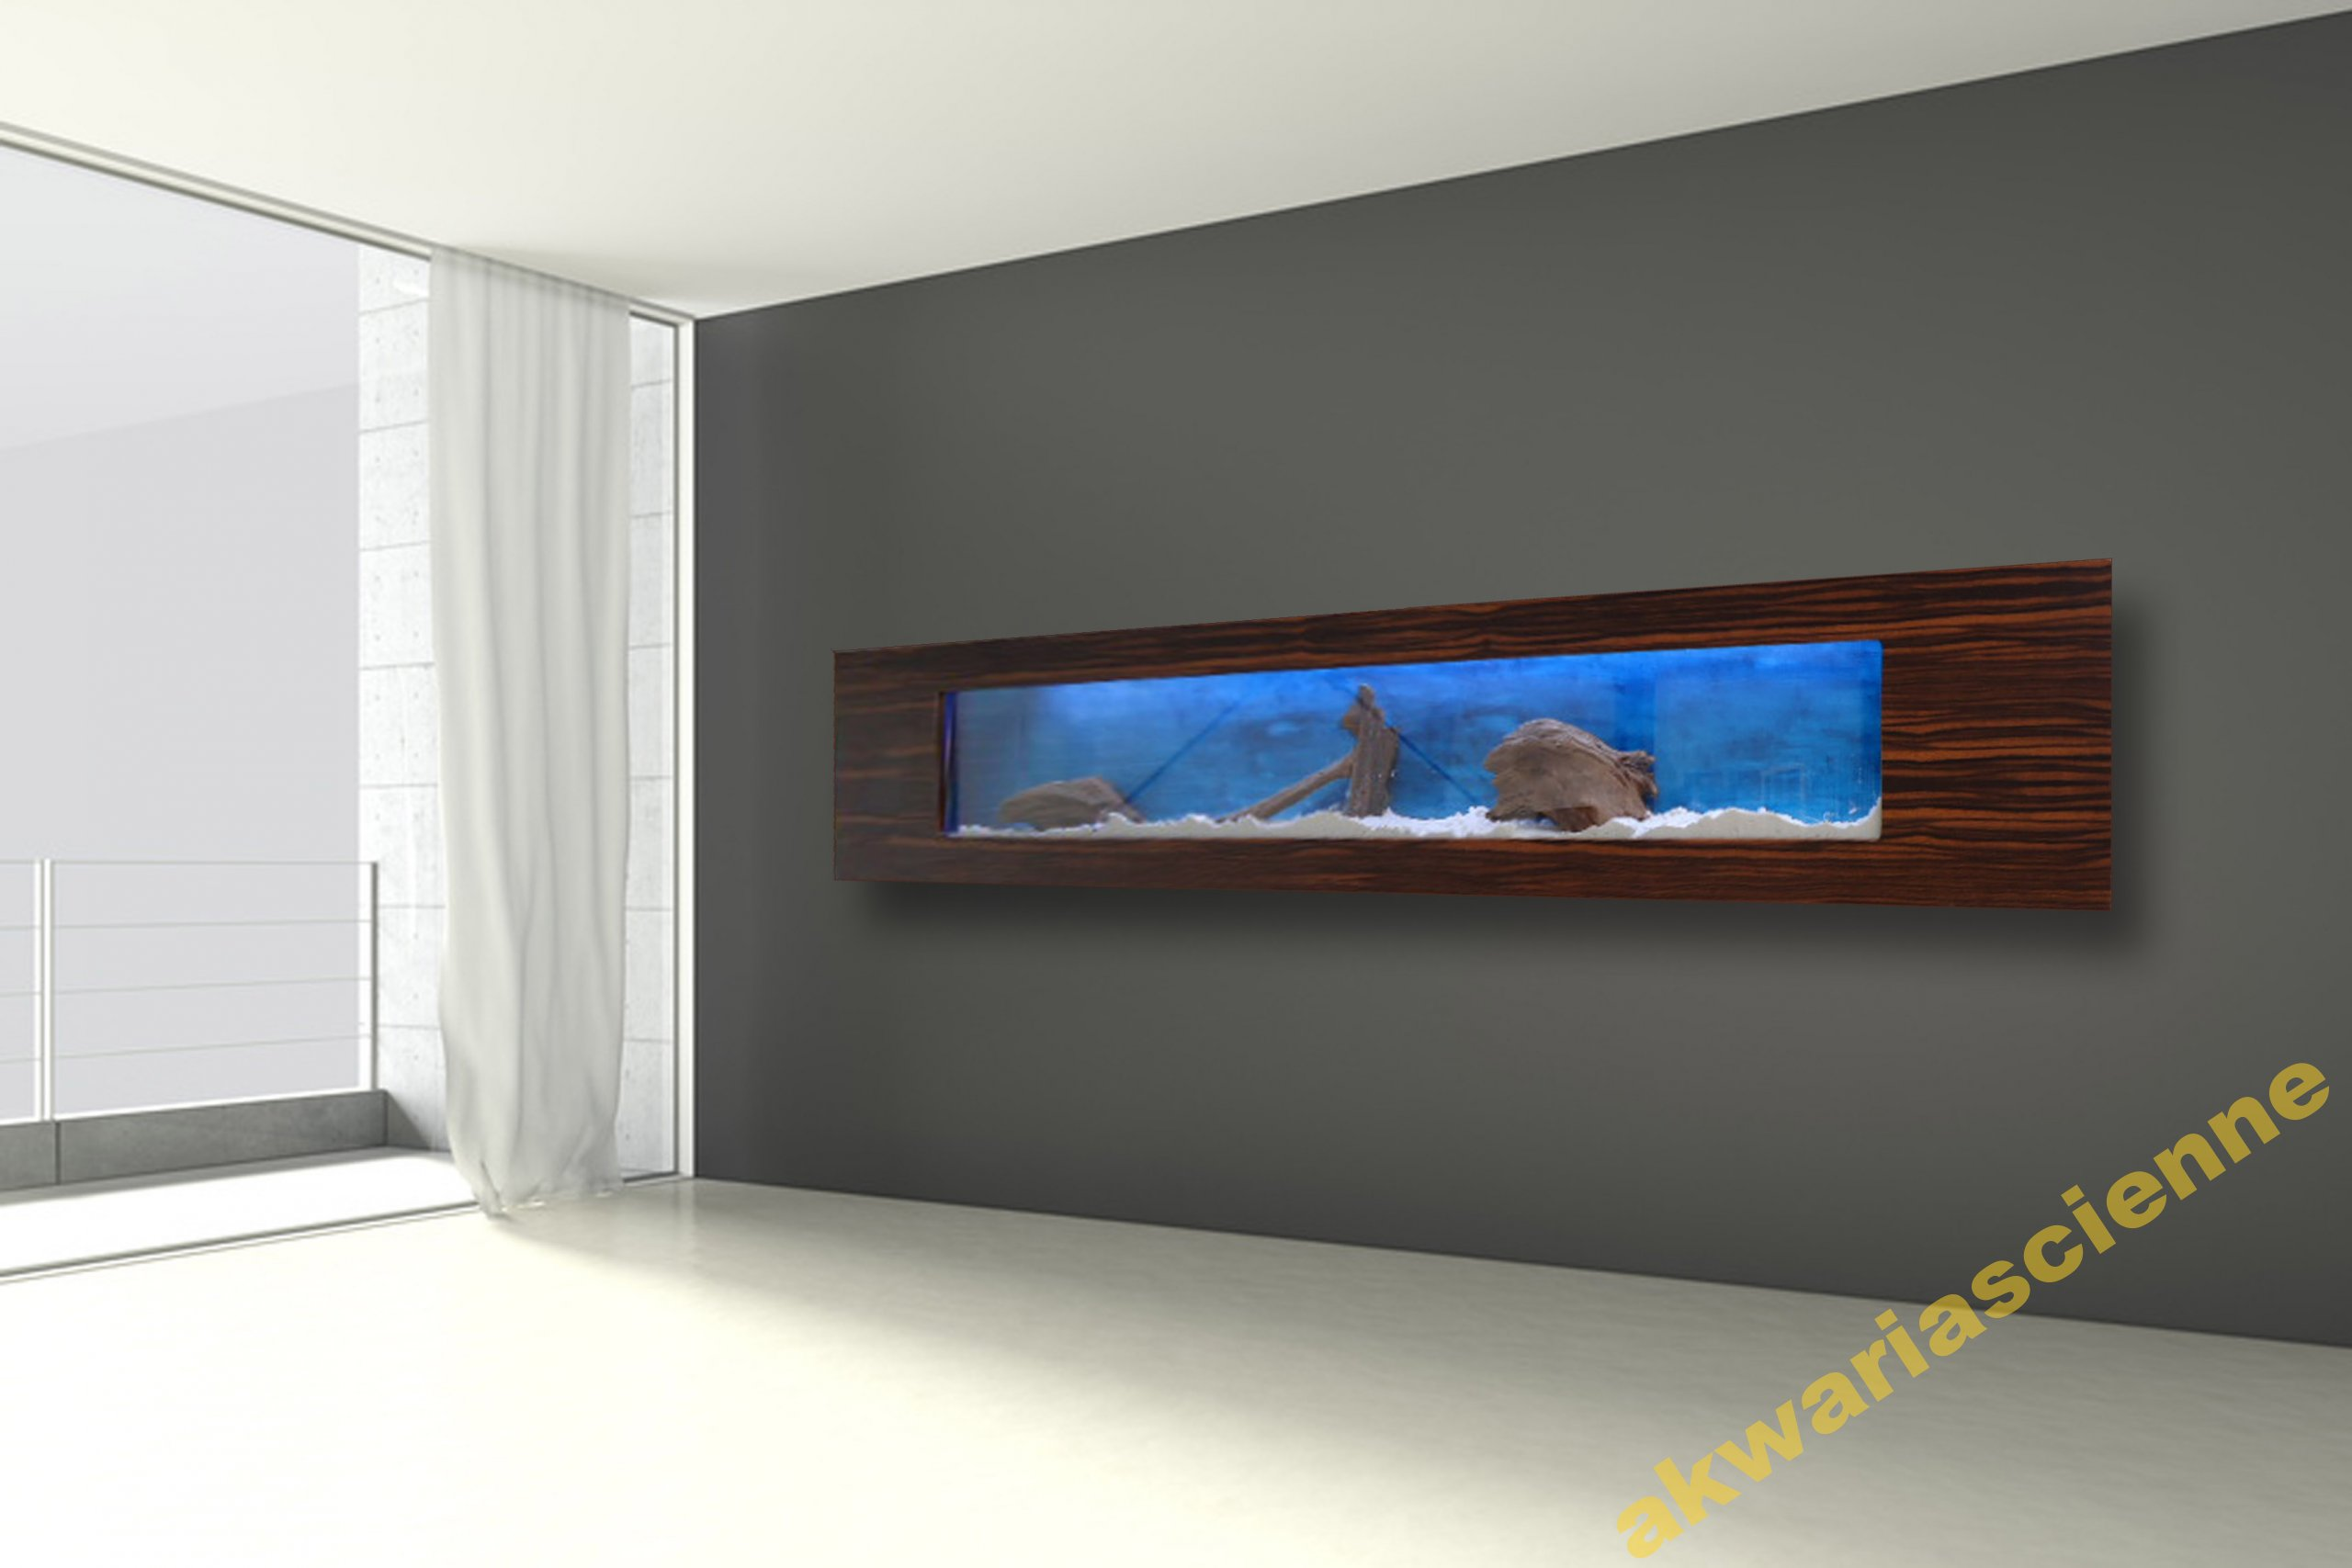 Akvárium visí Akvárium LED 250x50x16cm UMENIE